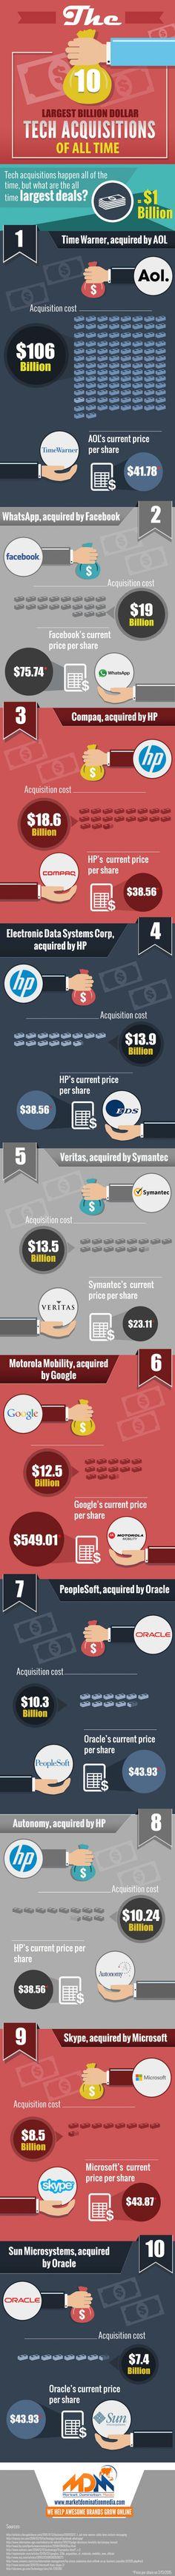 tech-uebernahmen-kauf-whatsapp-facebook-infografik